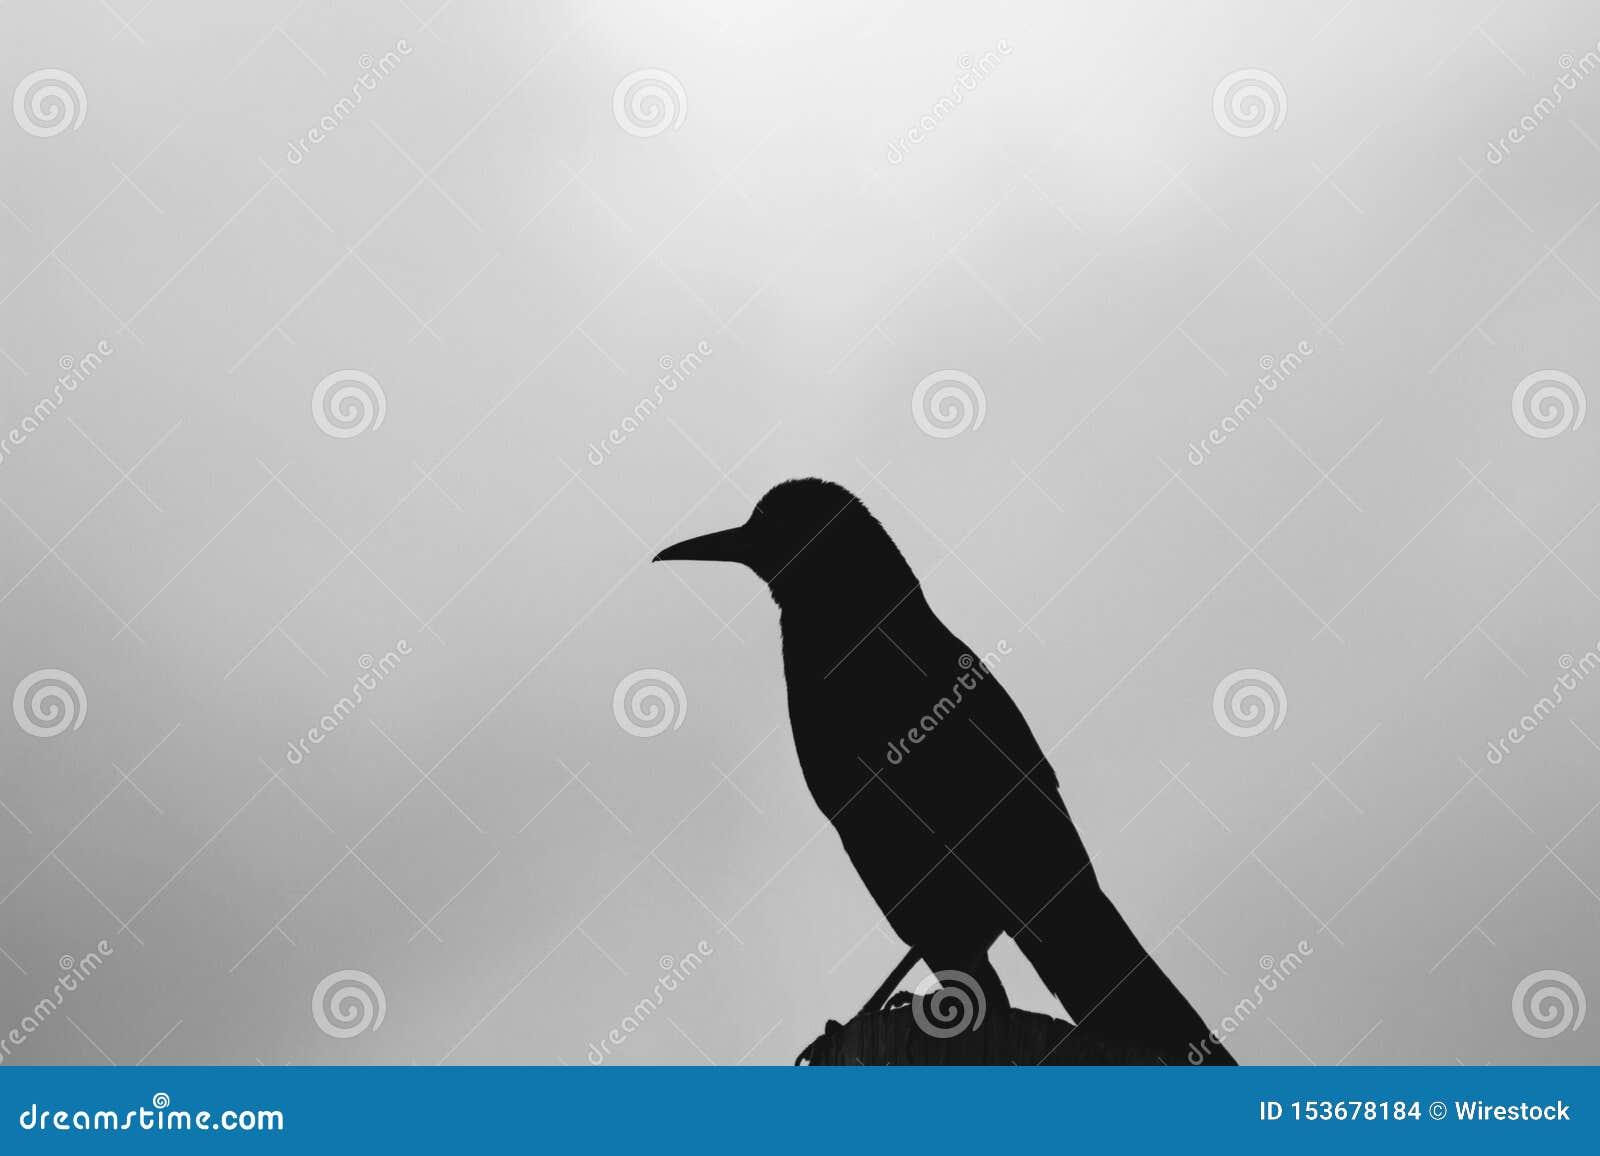 Silueta de un pájaro con un fondo natural borroso del cielo